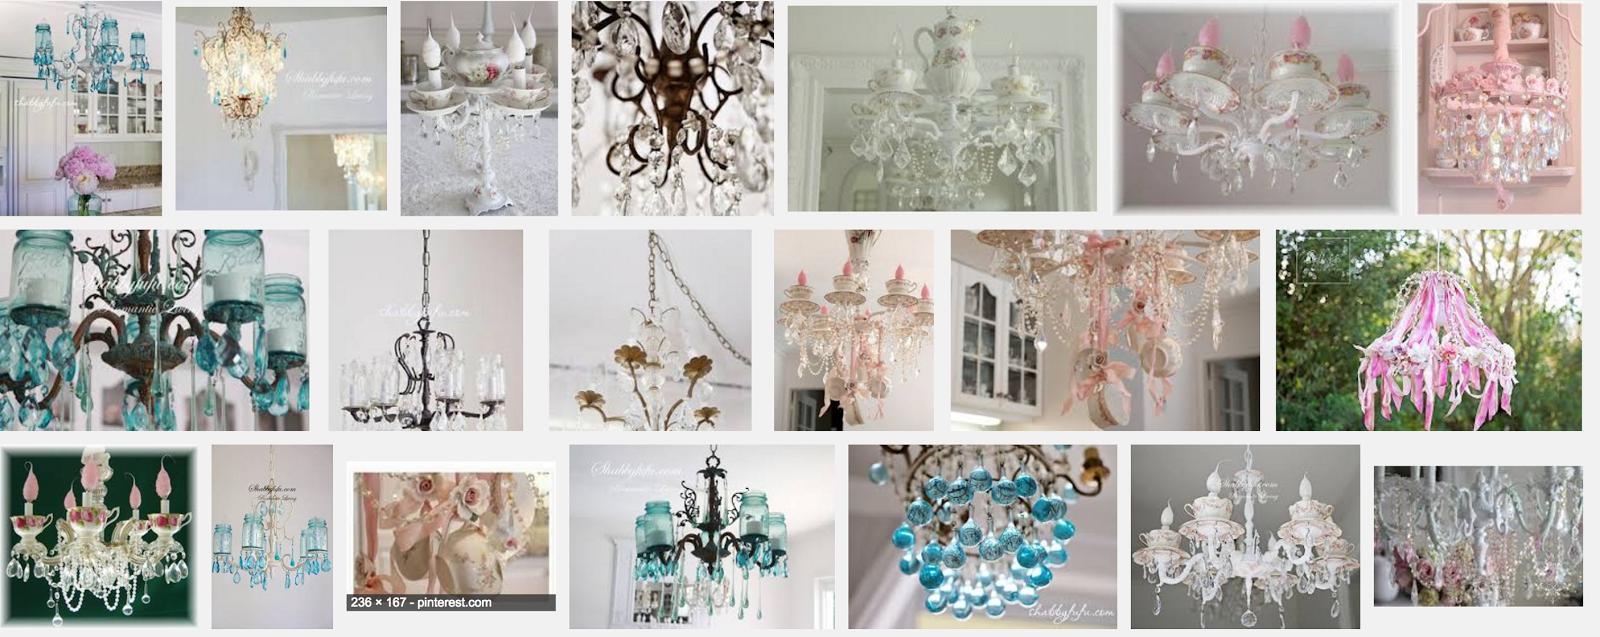 How to make a farmhouse mason jar chandelier shabbyfufu how to make a farmhouse mason jar chandelier arubaitofo Image collections